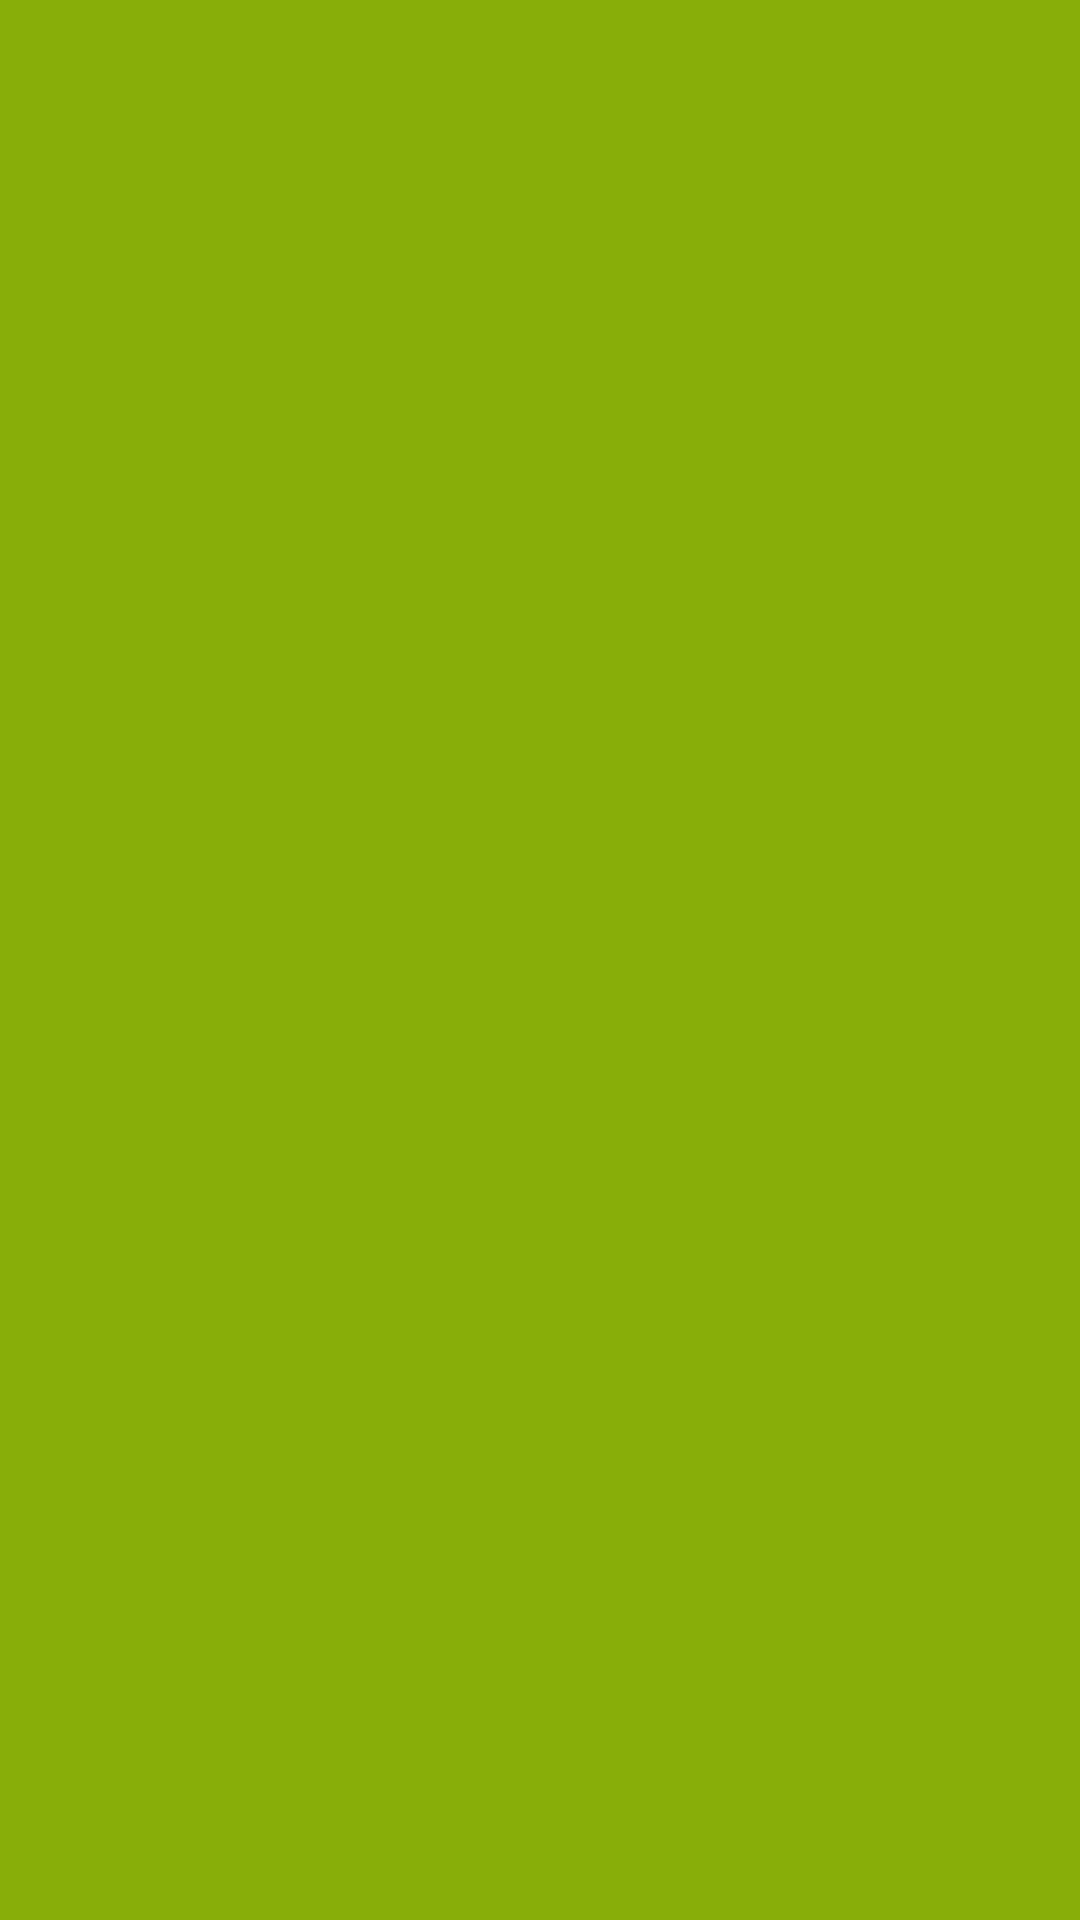 Solid Color iPhone Wallpaper - KoLPaPer ...